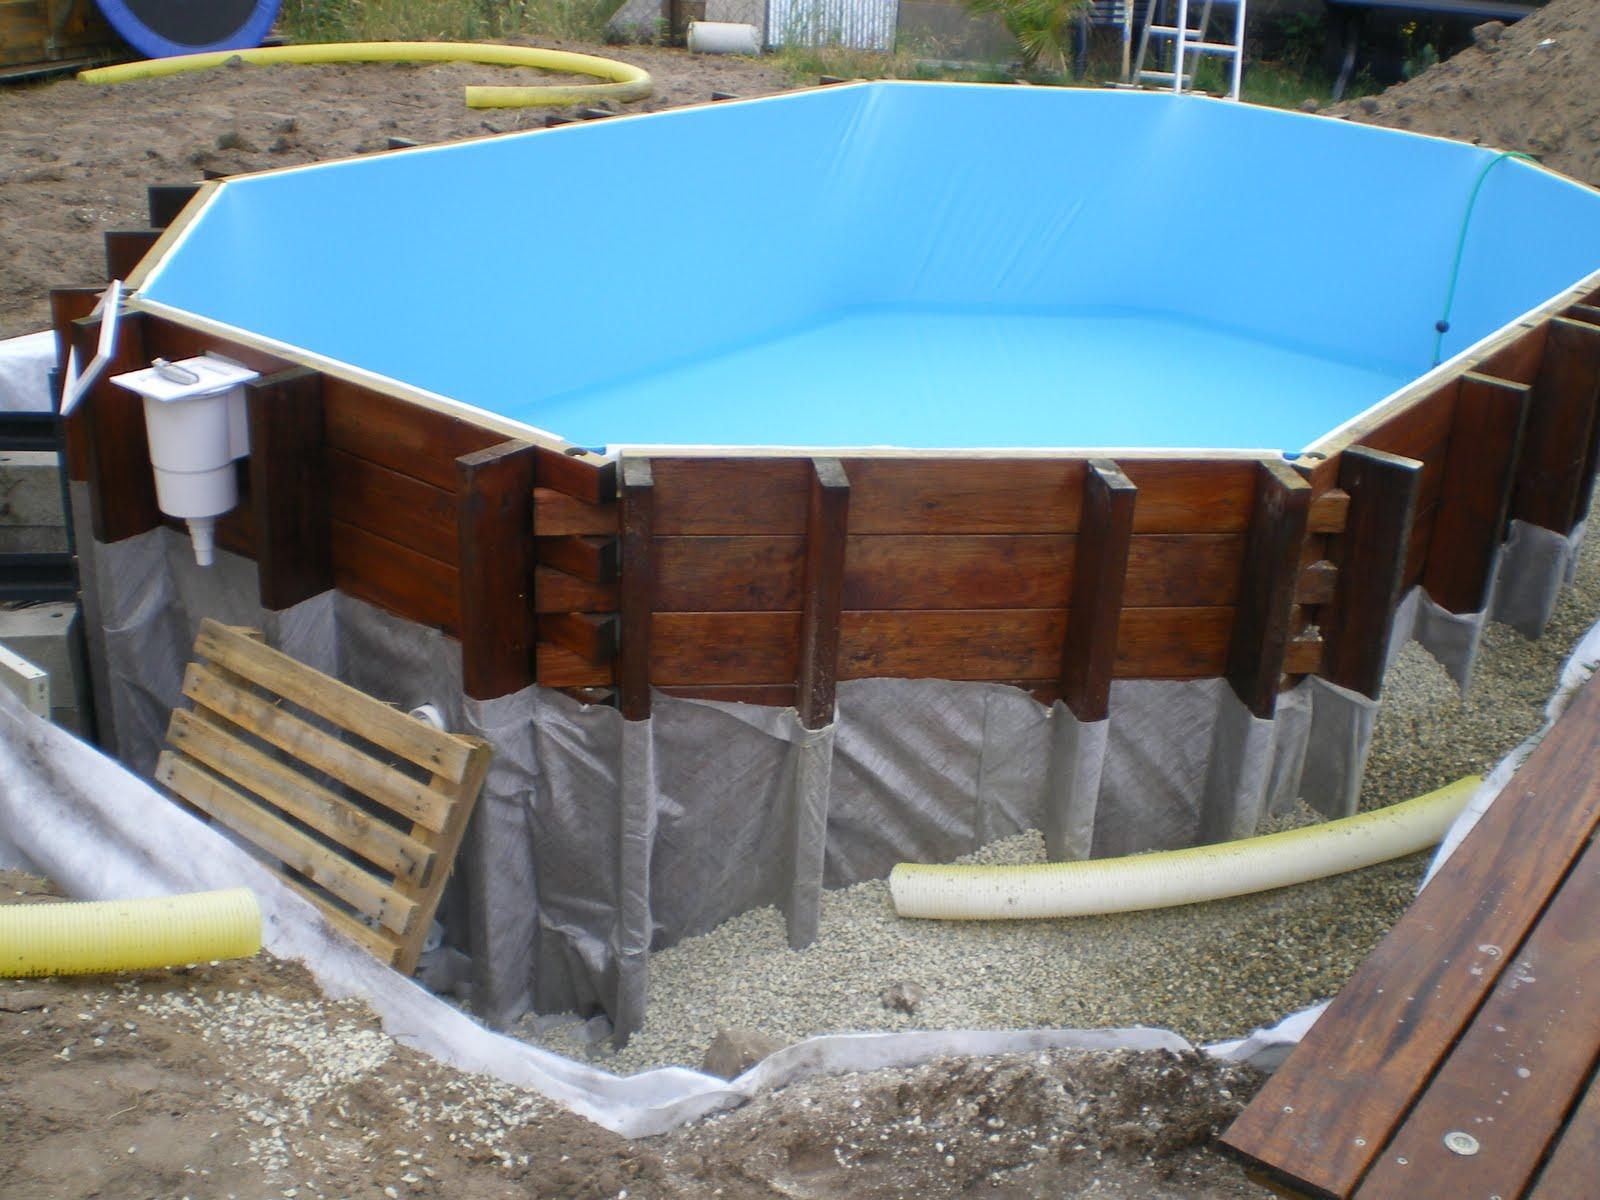 piscine en kit bois phase 5 mise en eau et pose du drainant. Black Bedroom Furniture Sets. Home Design Ideas